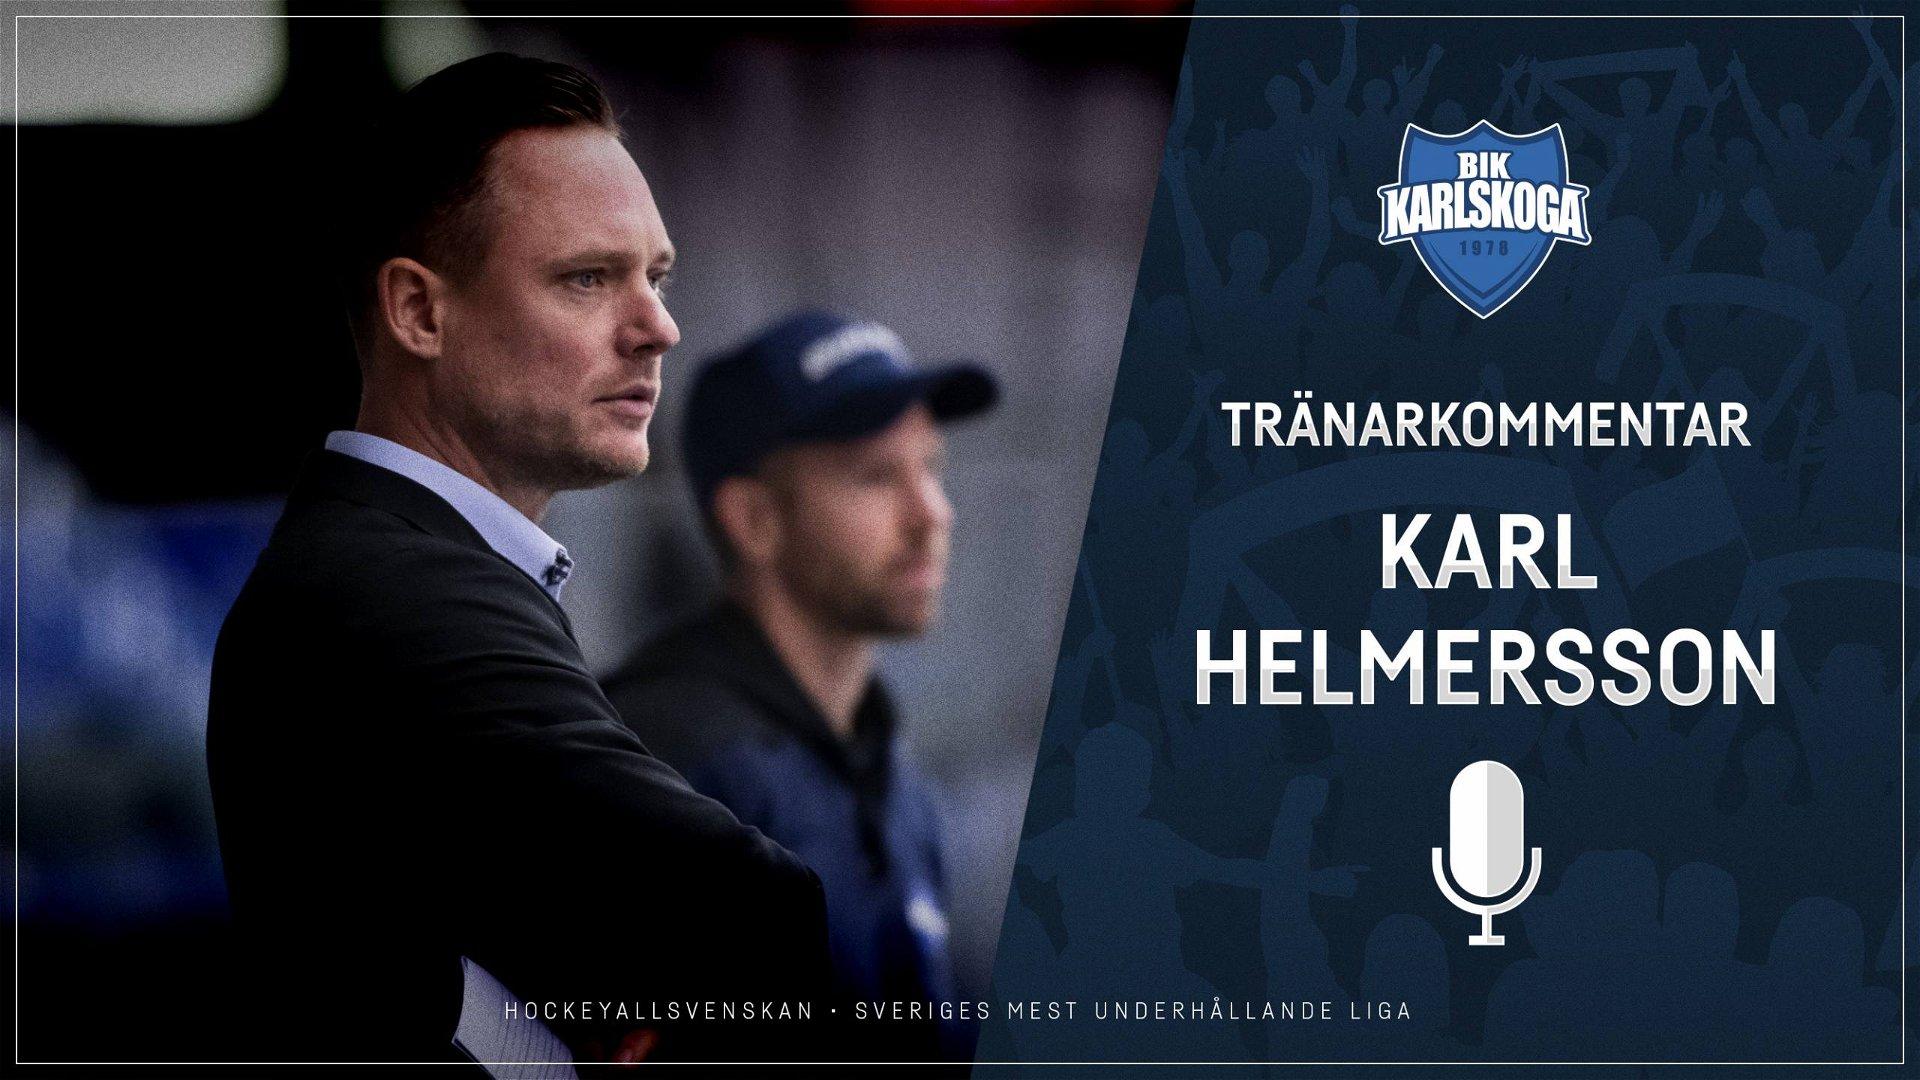 2021-01-20 Segerintervju: Karl Helmersson